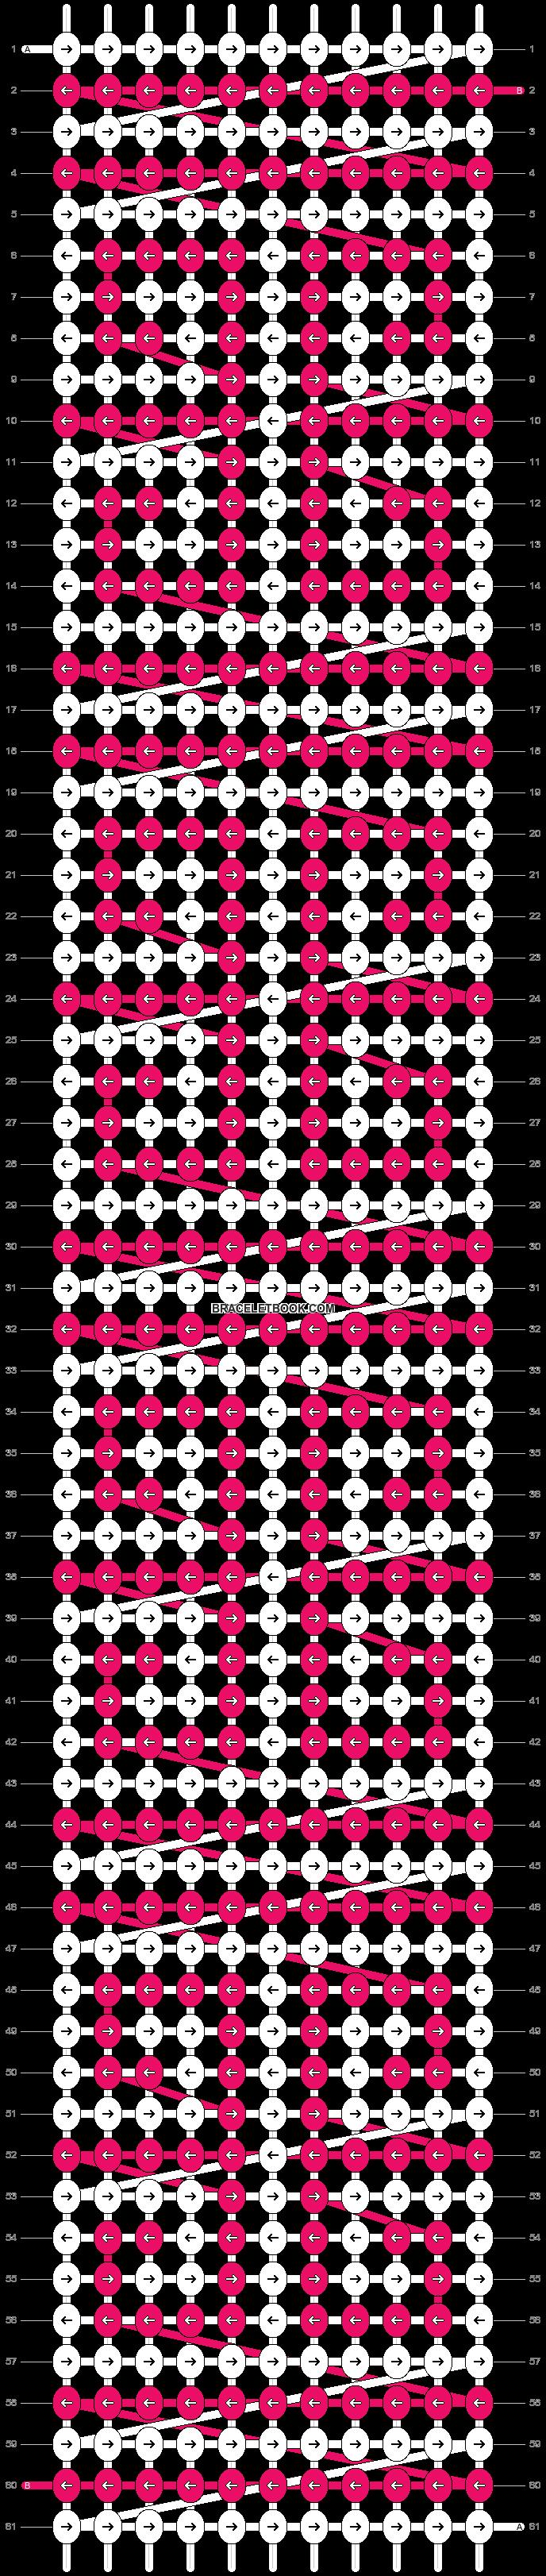 Alpha pattern #20945 variation #9683 pattern